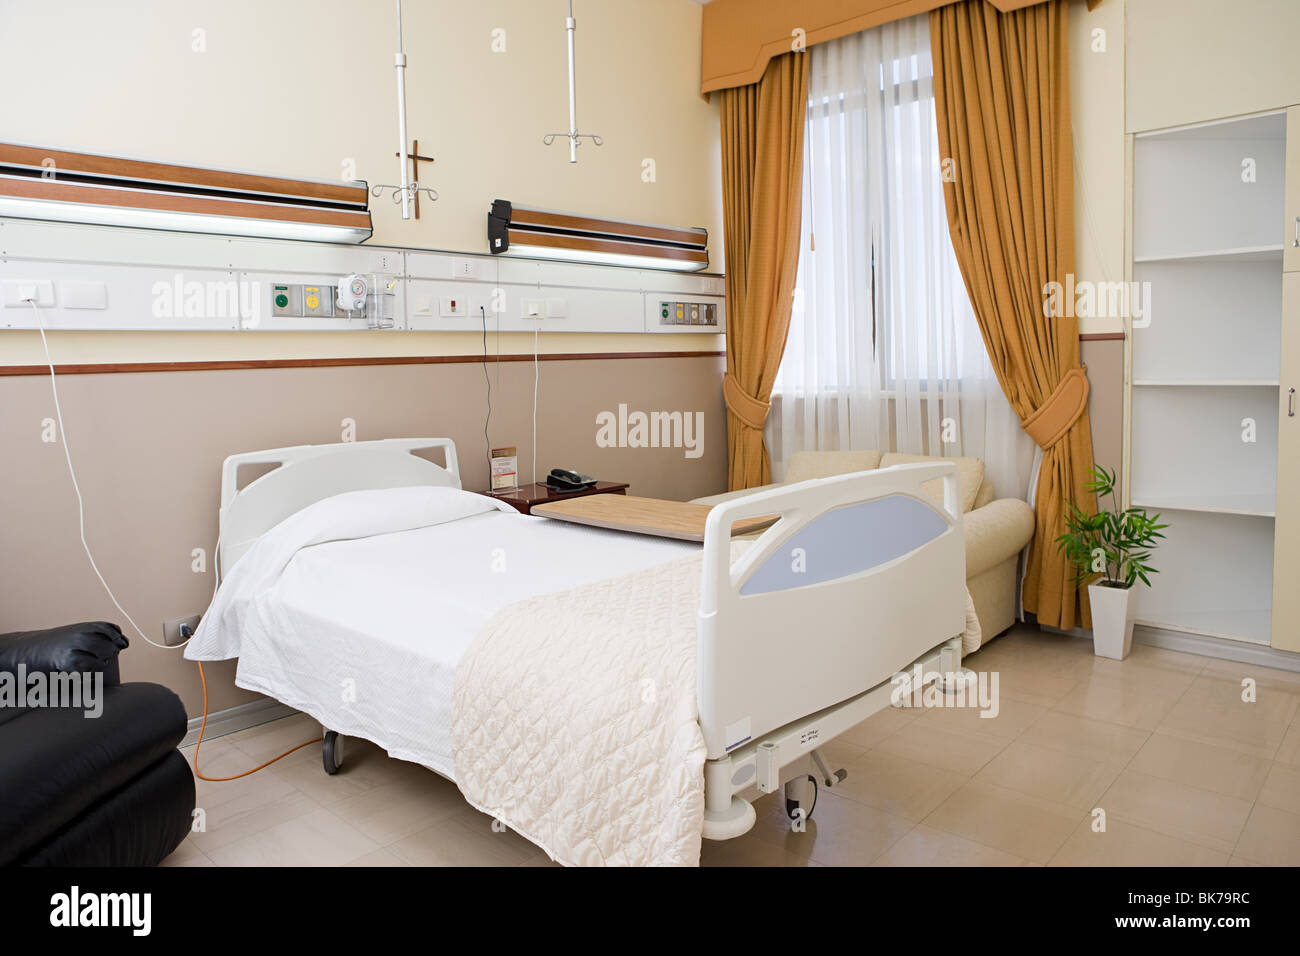 Hospital room - Stock Image